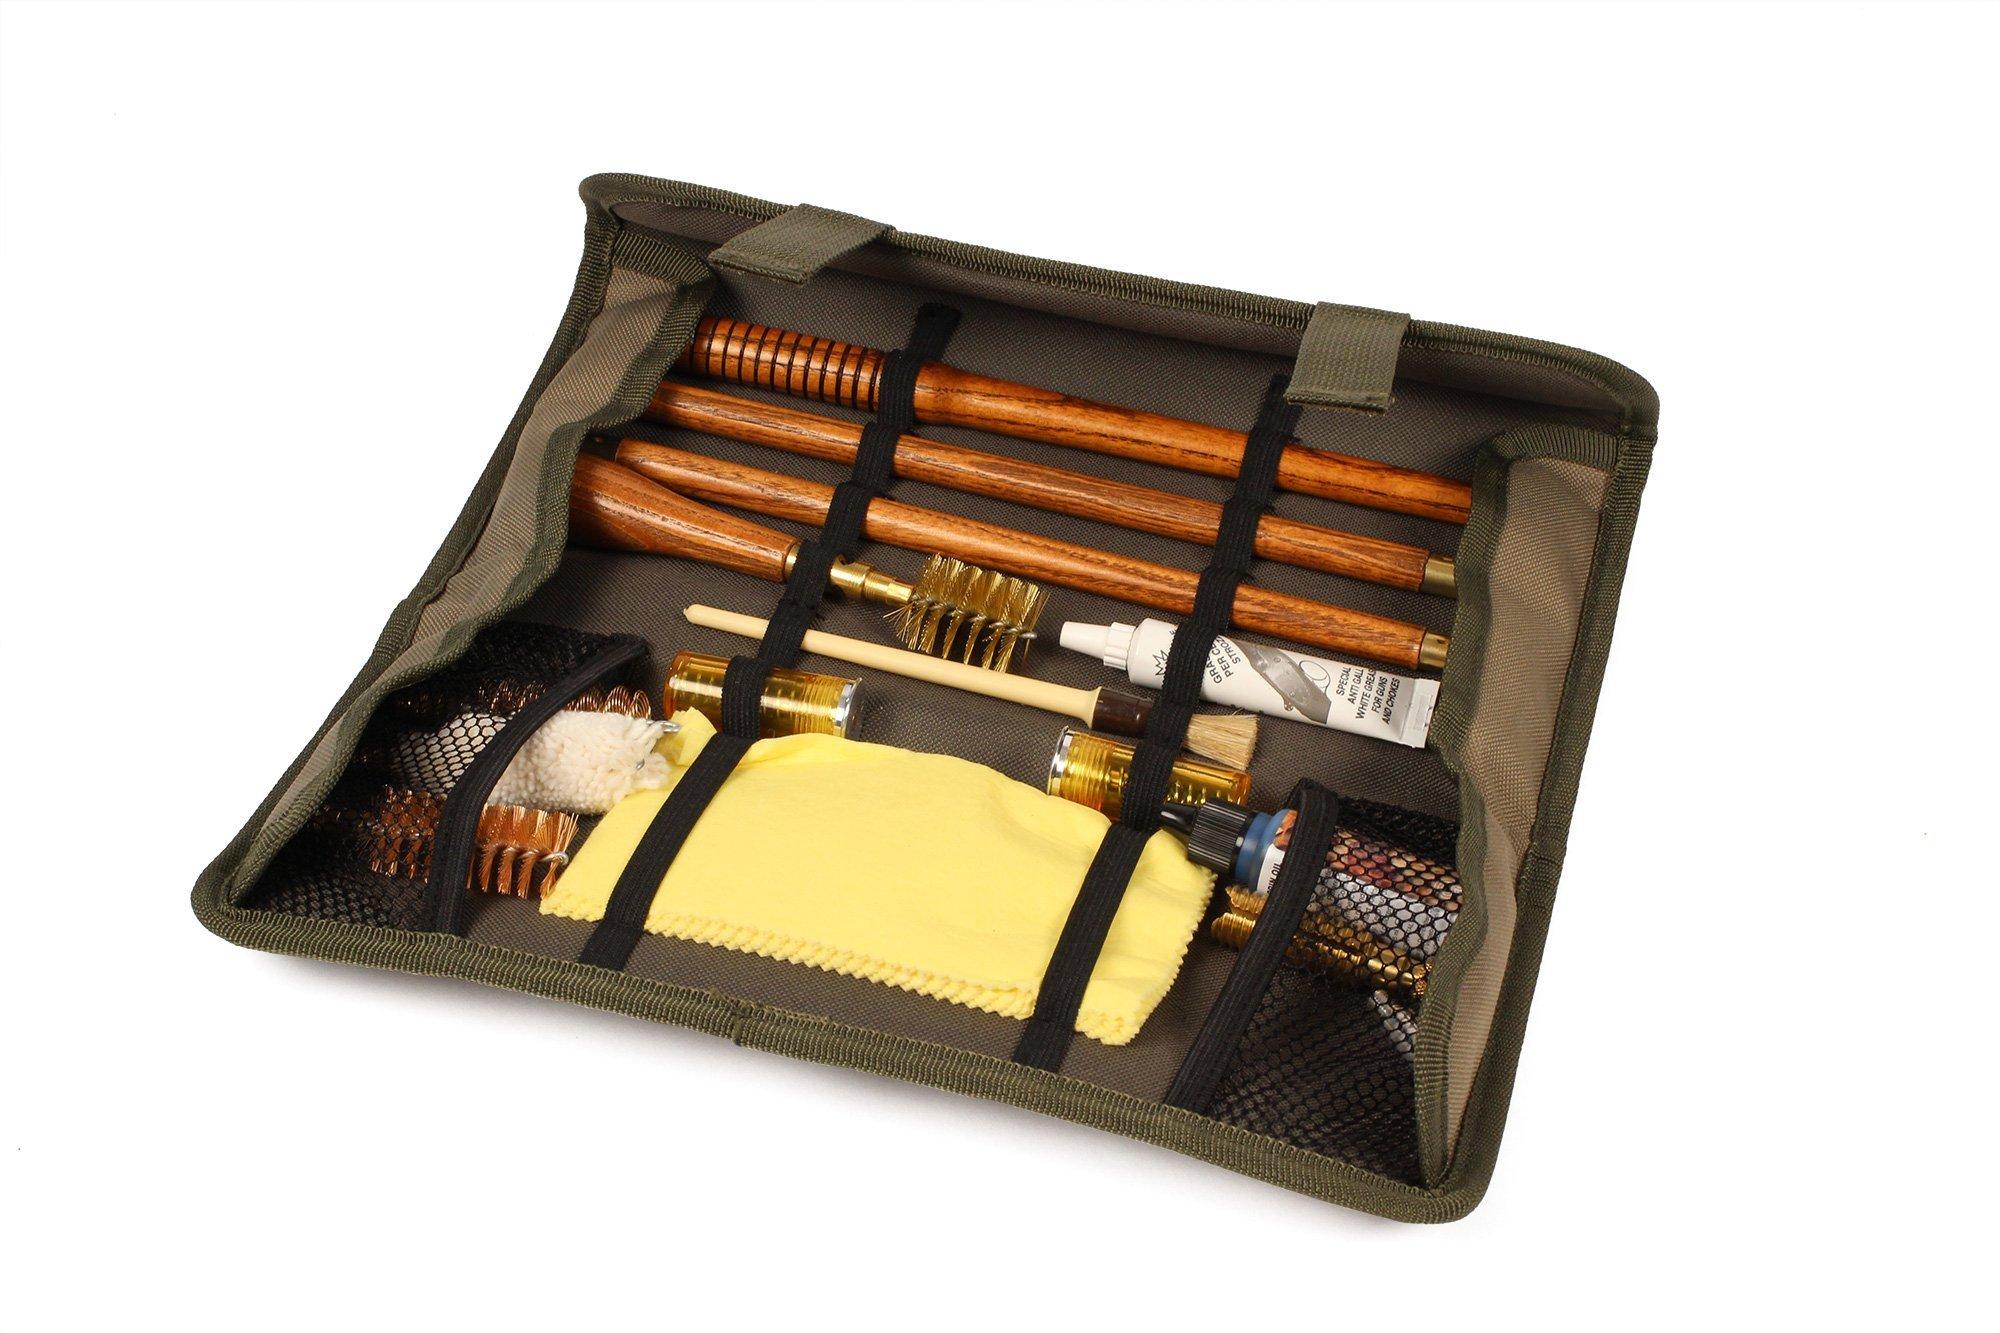 STIL CRIN UPLAND Wood Shotgun Cleaning Kit (20 ga) - STILCRIN-TF/H20 - Made in Italy